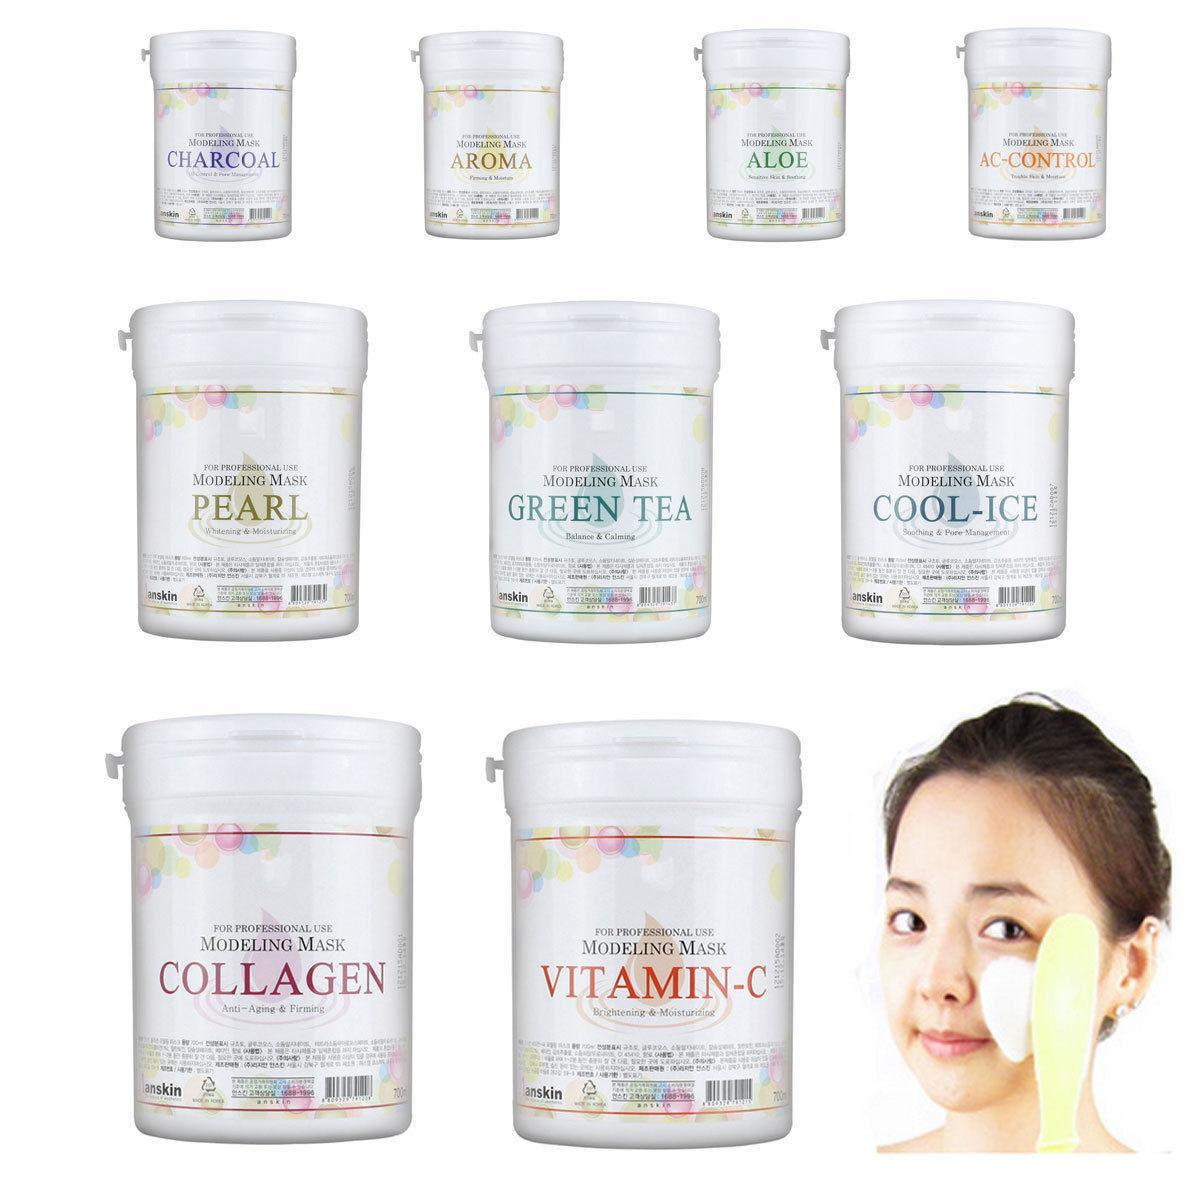 ZANABILI ANSkin Modeling Mask 700ml Face Care Skin Brightening Moisturizing Whitening Soothing Facial Mask Korean Face Mask 240g